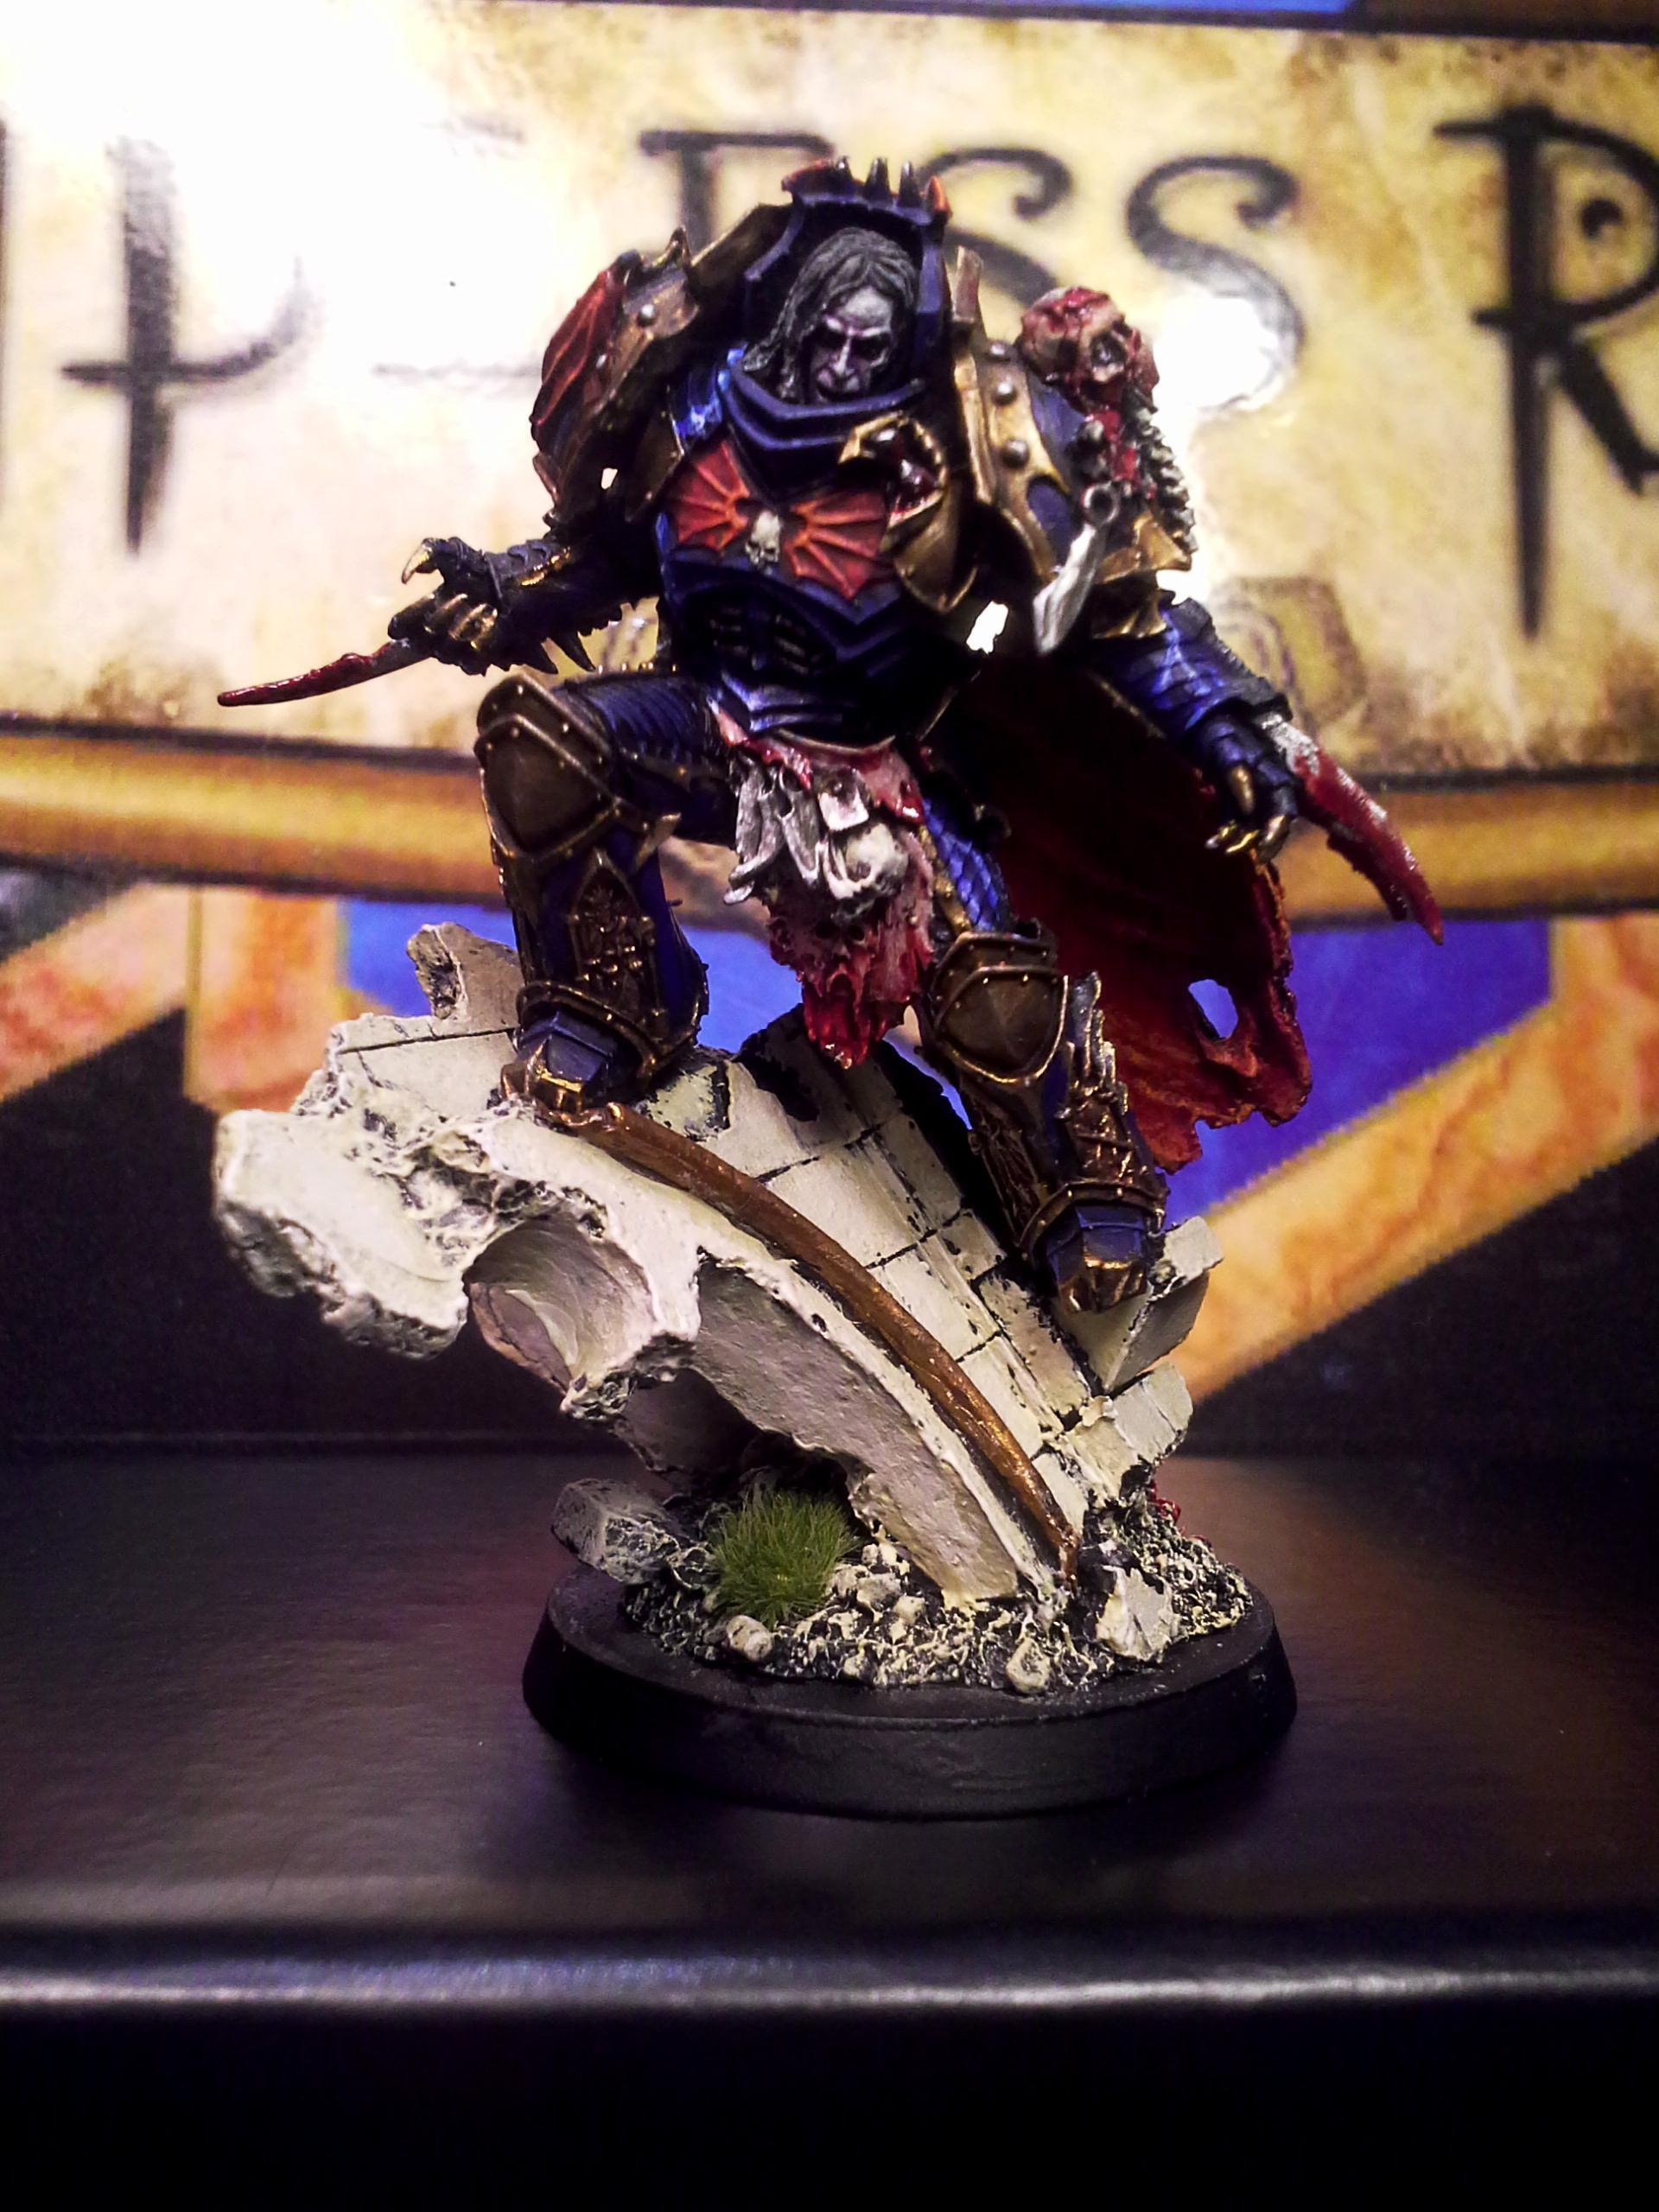 Blood, Corpse, Curze, Forge World, Horus Heresy, Konrad, Lightning, Nightlords, Primarch